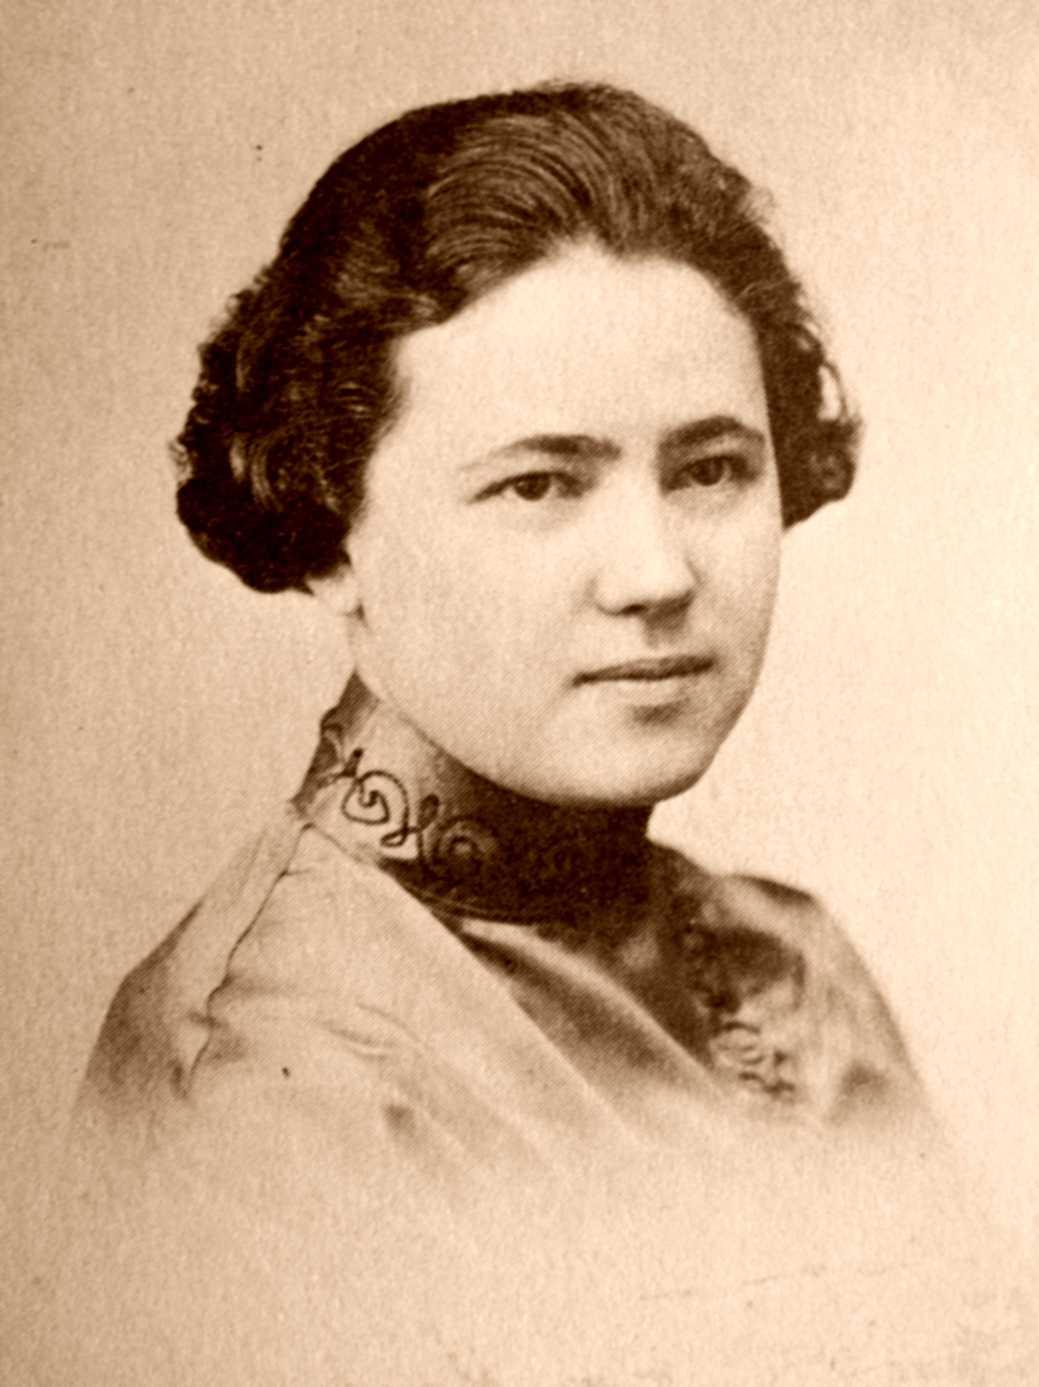 Mollie Steimer (ca. 1918)